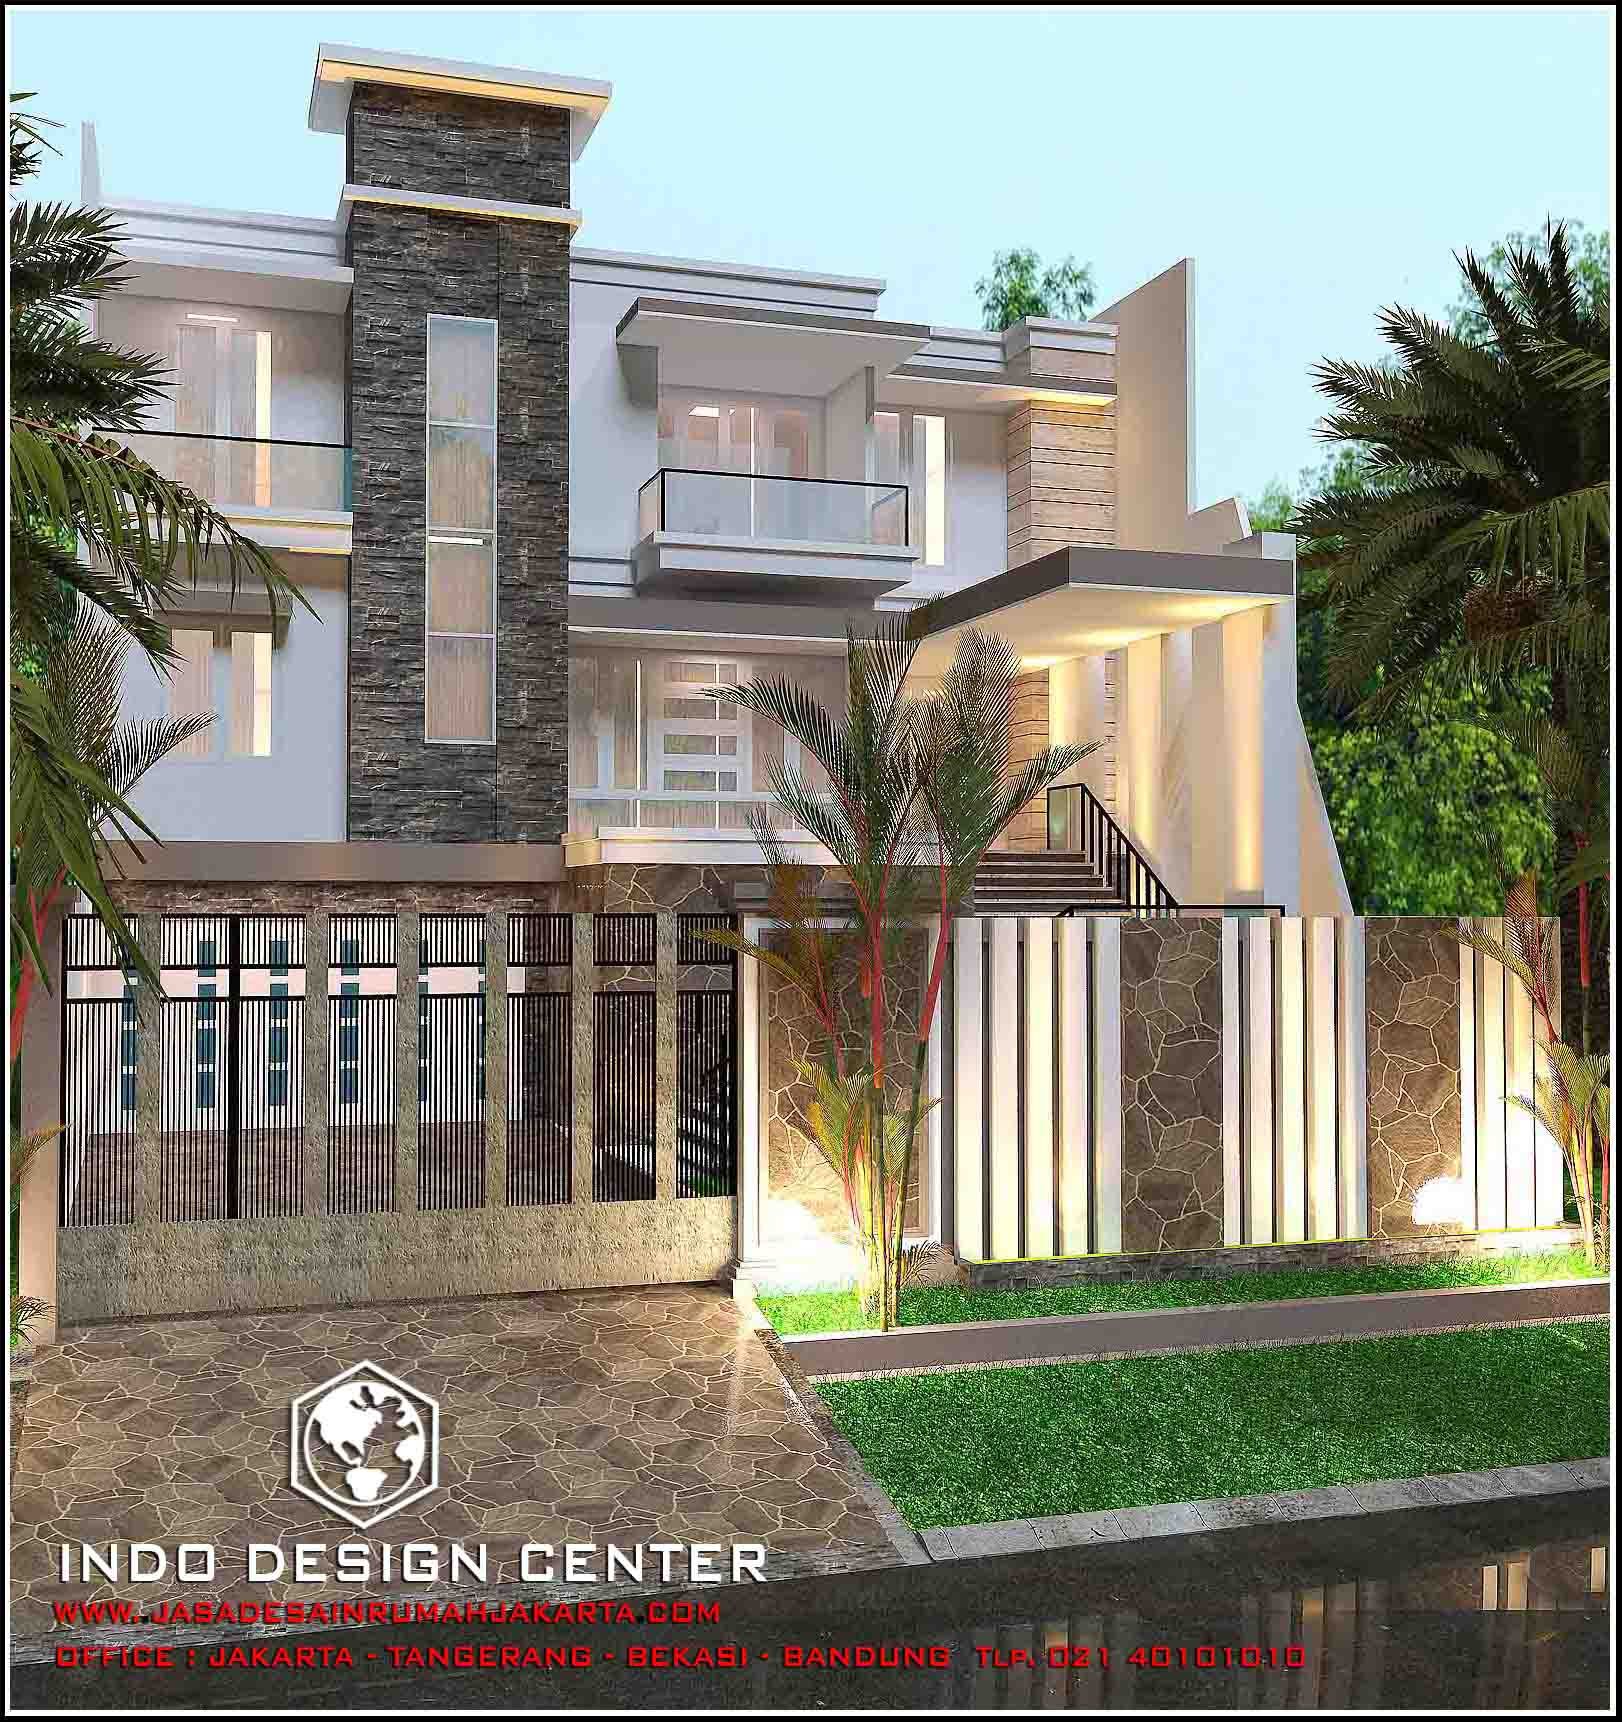 Jasa desain rumah minimalis di jakarta our families journey for Arsitek di jakarta